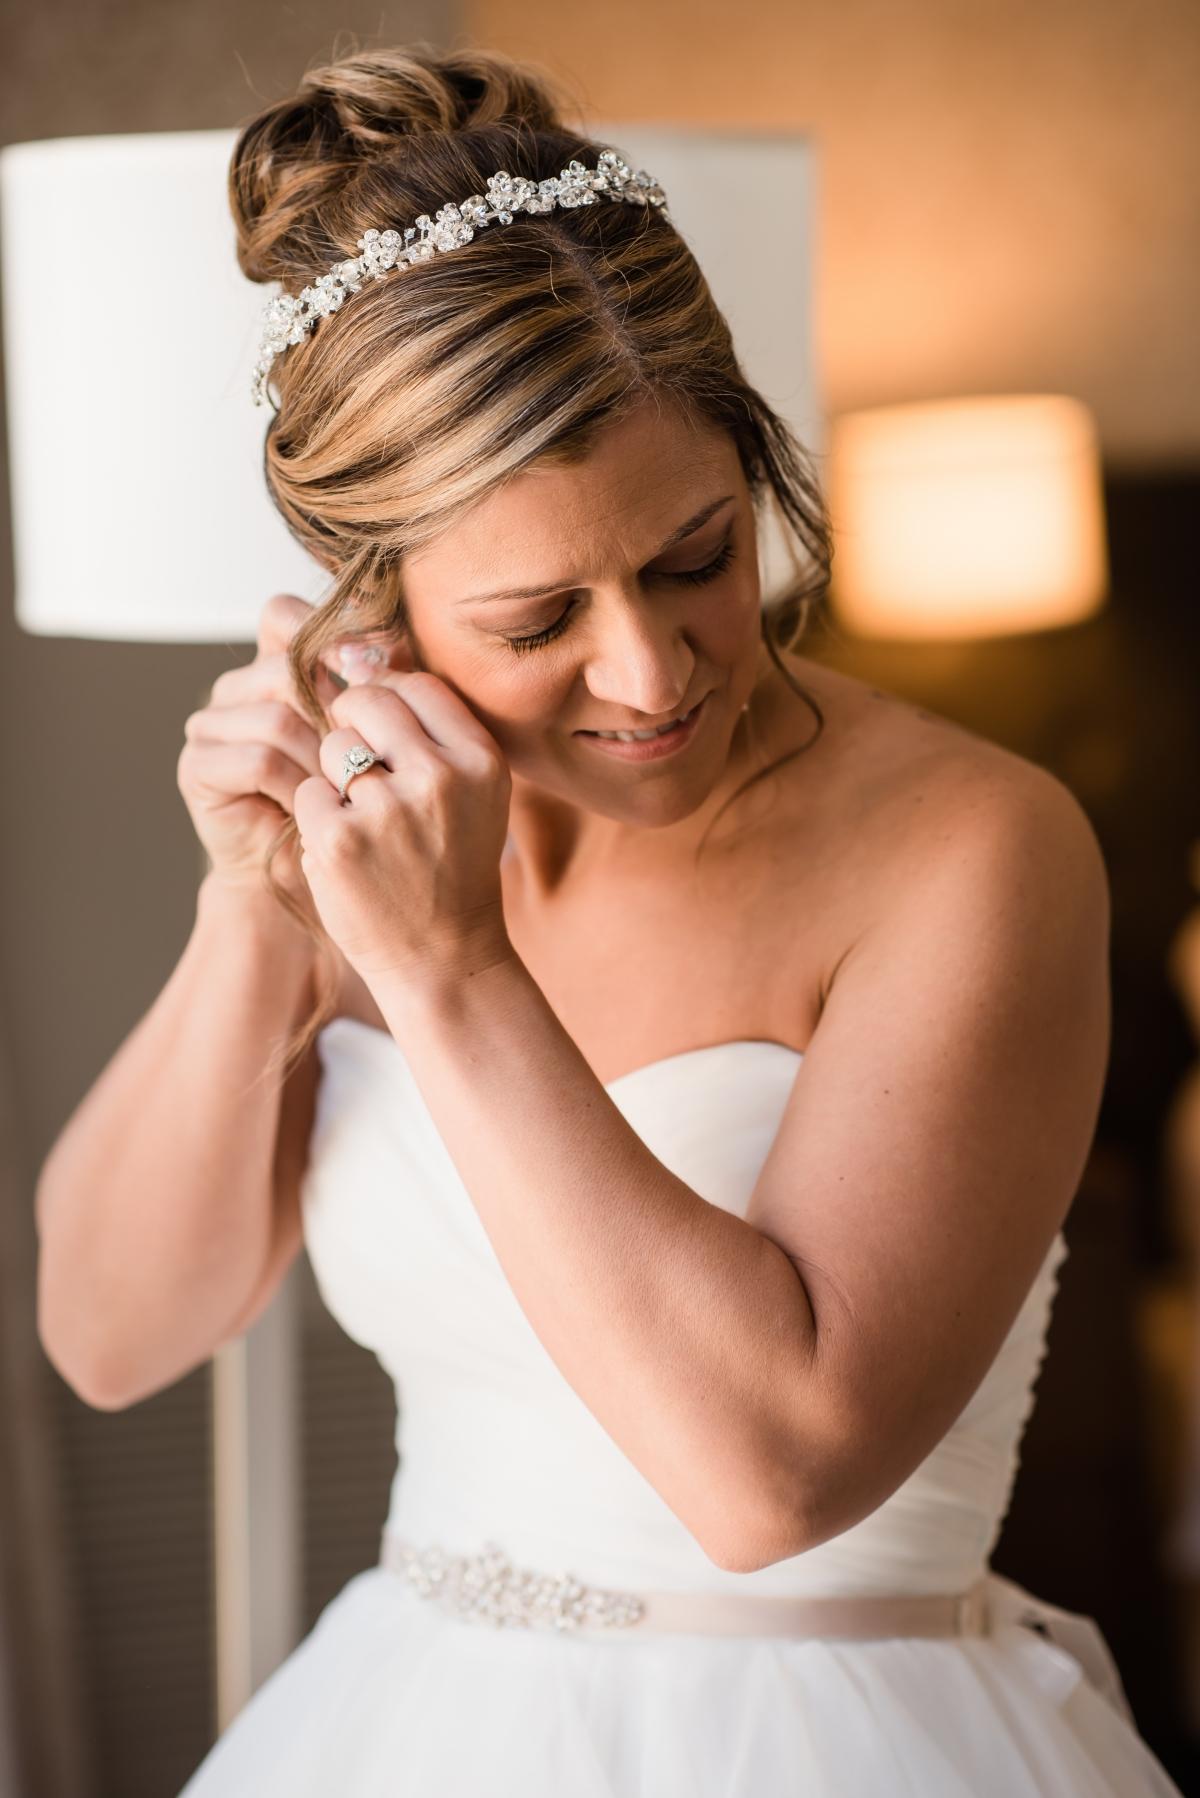 9 19 20 Lori Tiff Wedding 039